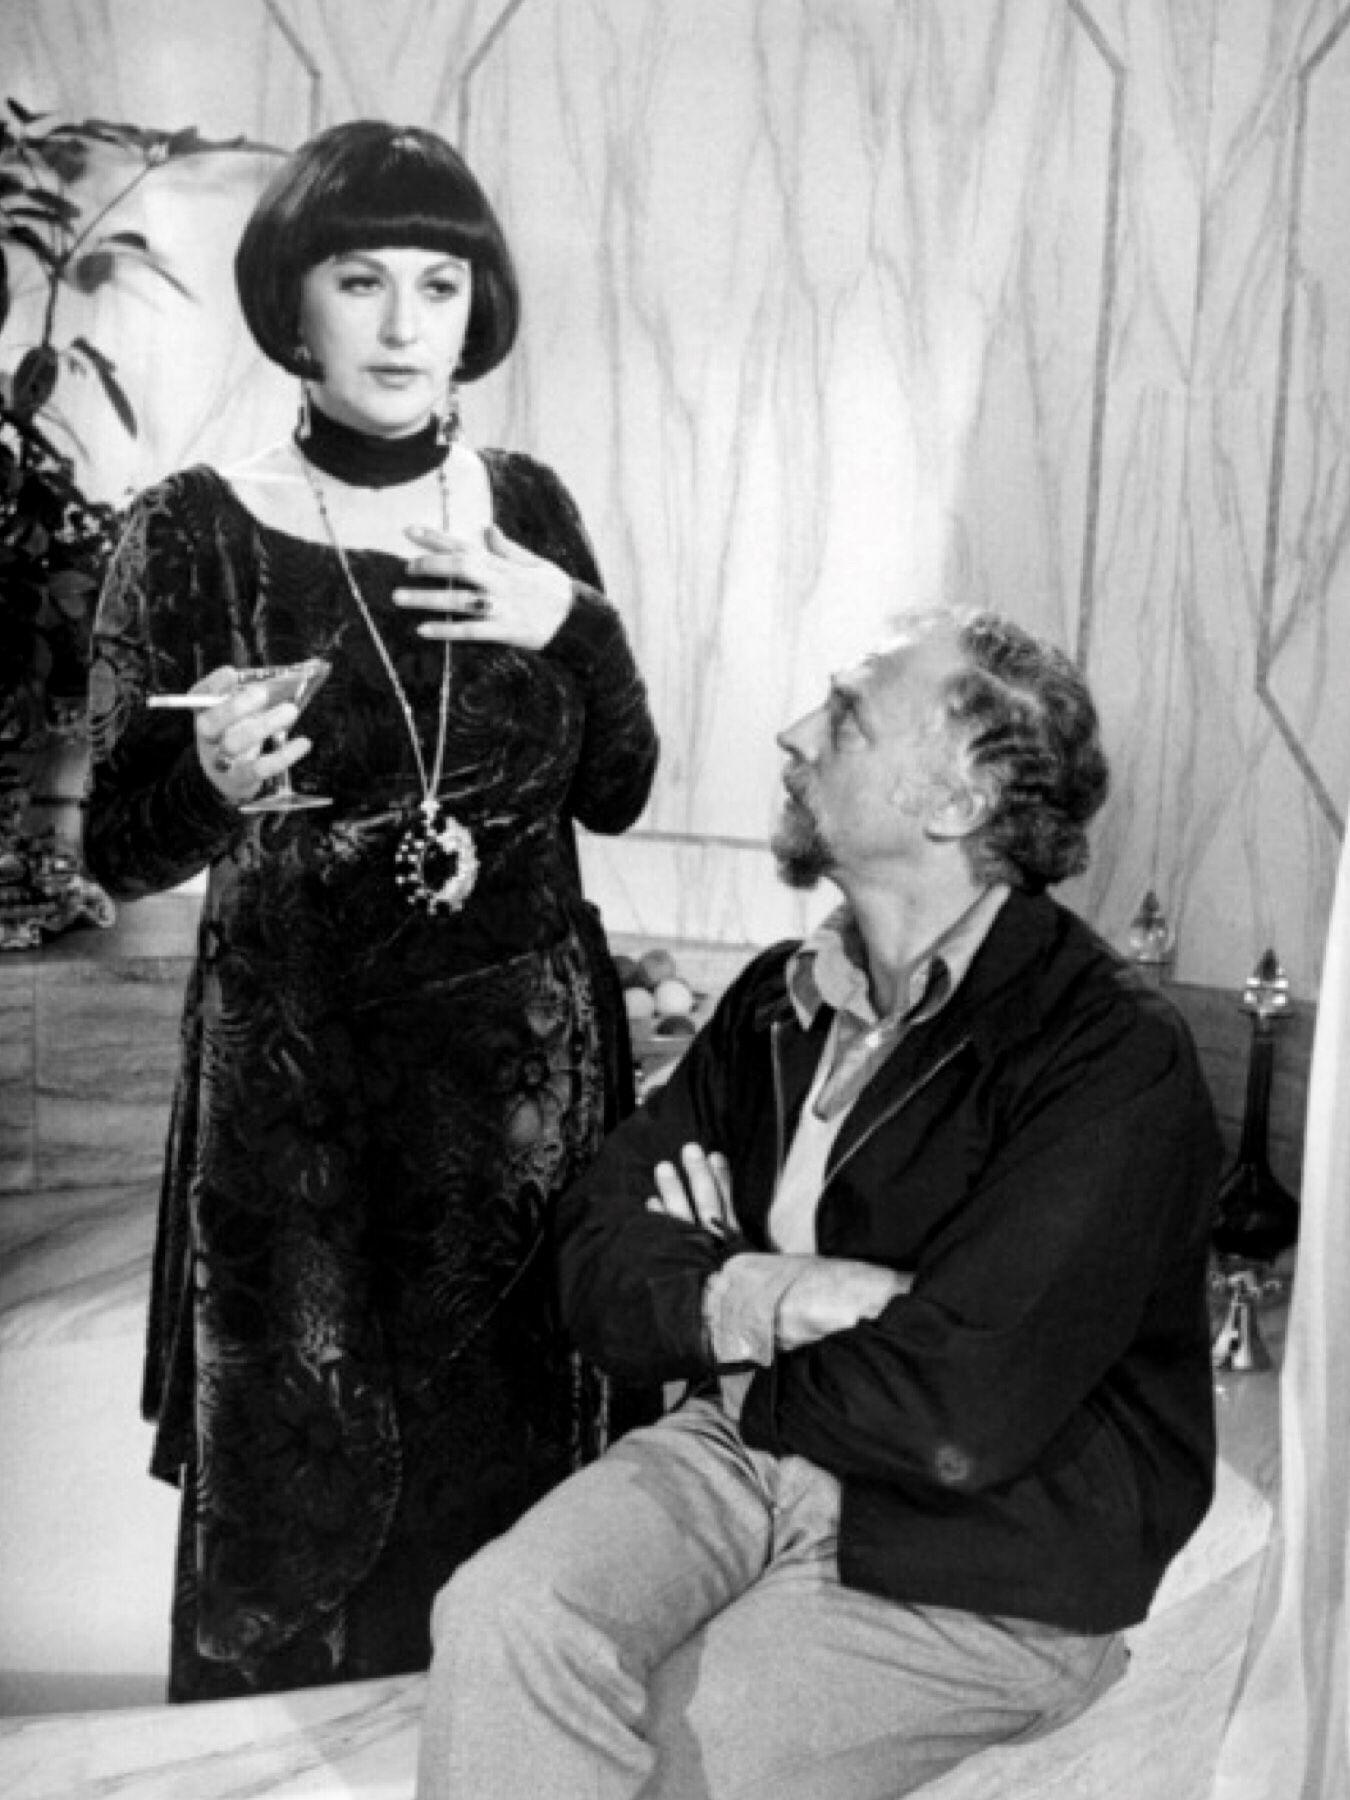 Bea arthur and director husband gene saks on the set of